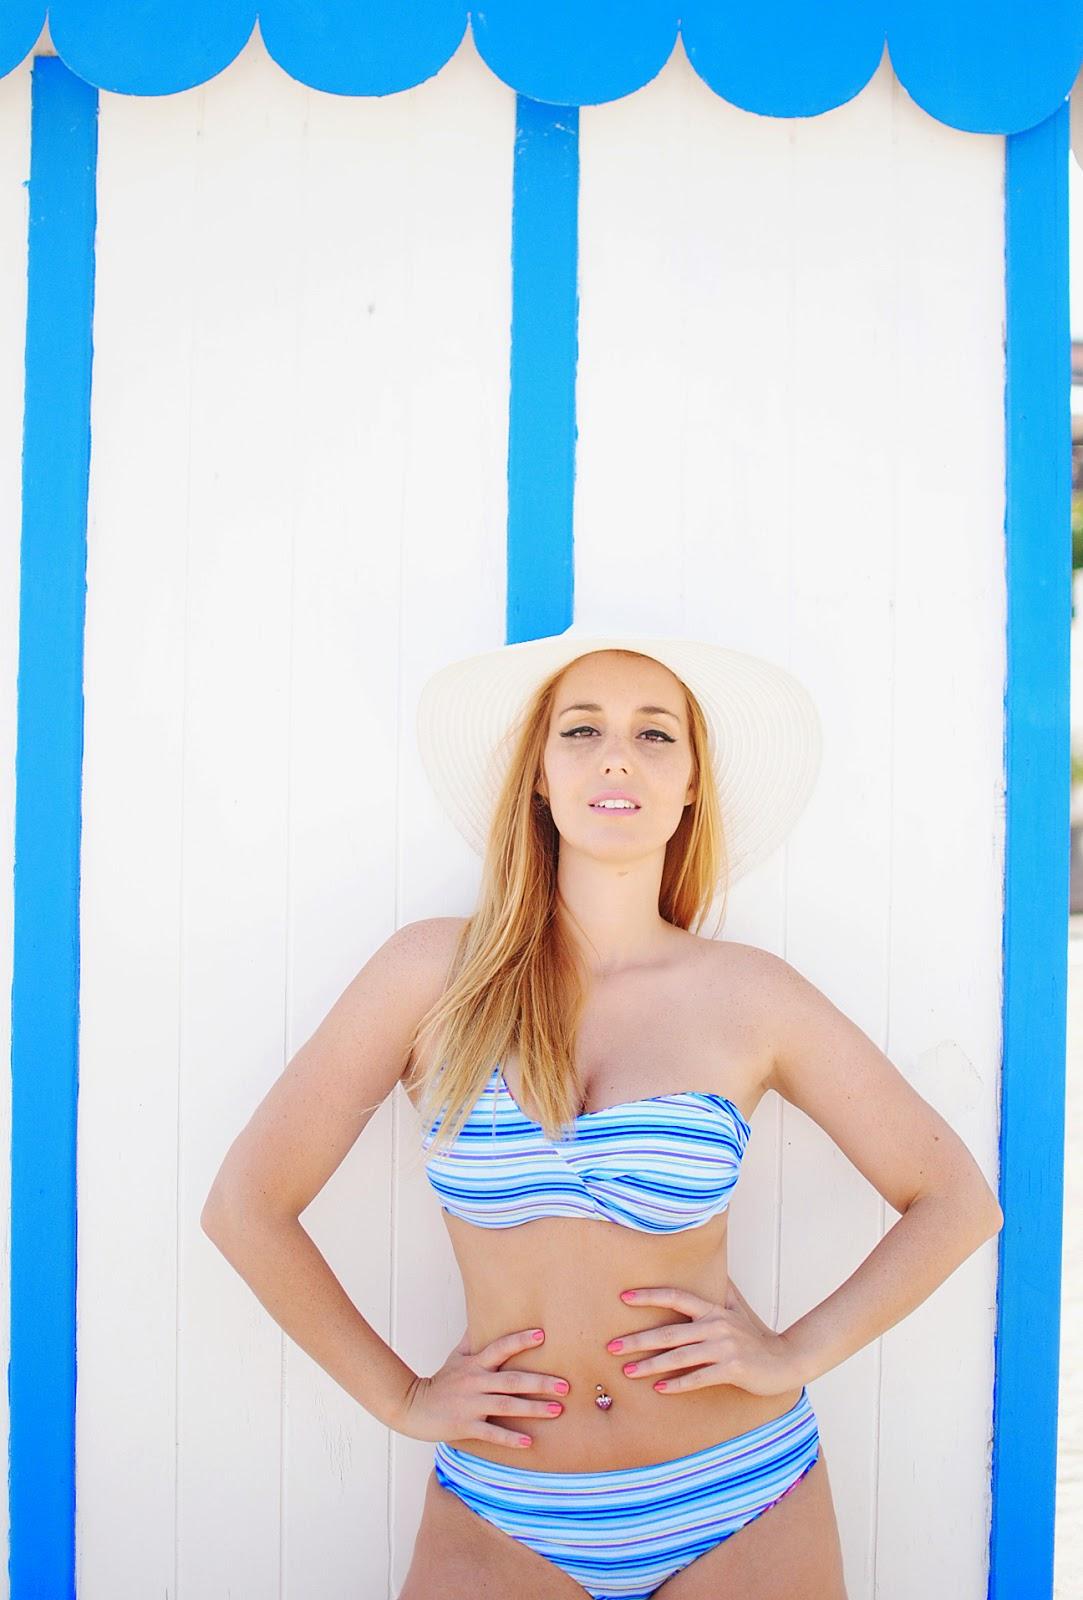 nery hdez, bikini, divissima swimwear, bikini reversible,two-sided bikini